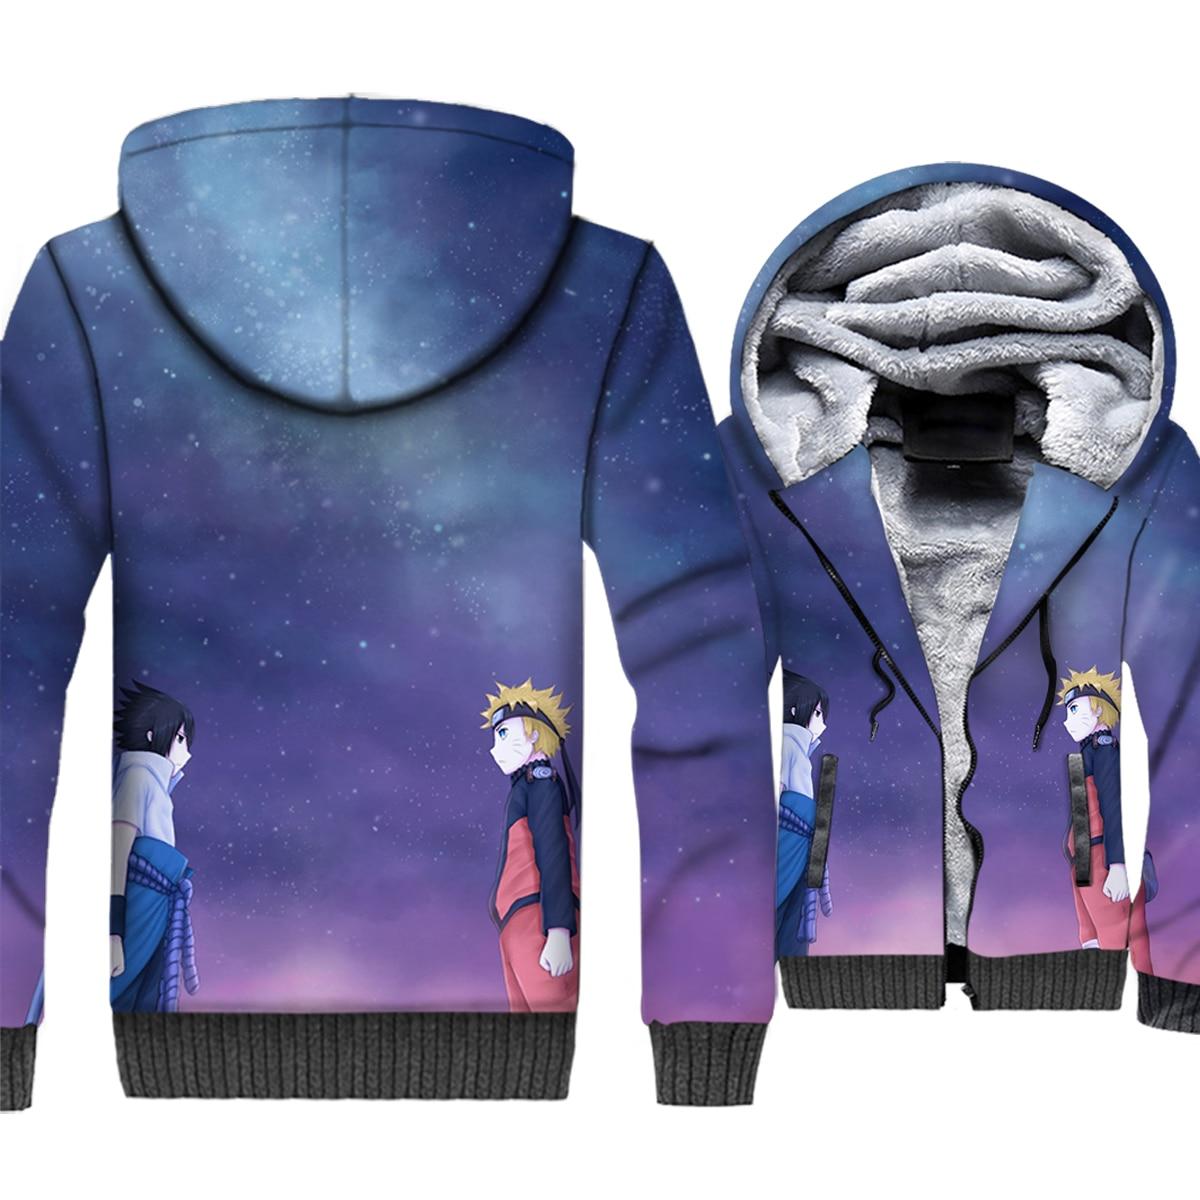 Uzumaki Naruto & Uchiha Sasuke Anime 3D Hoodies 2019 Winter Fashion Casual Sweatshirt Men Warm Jackets Harajuku Plus Size Coat